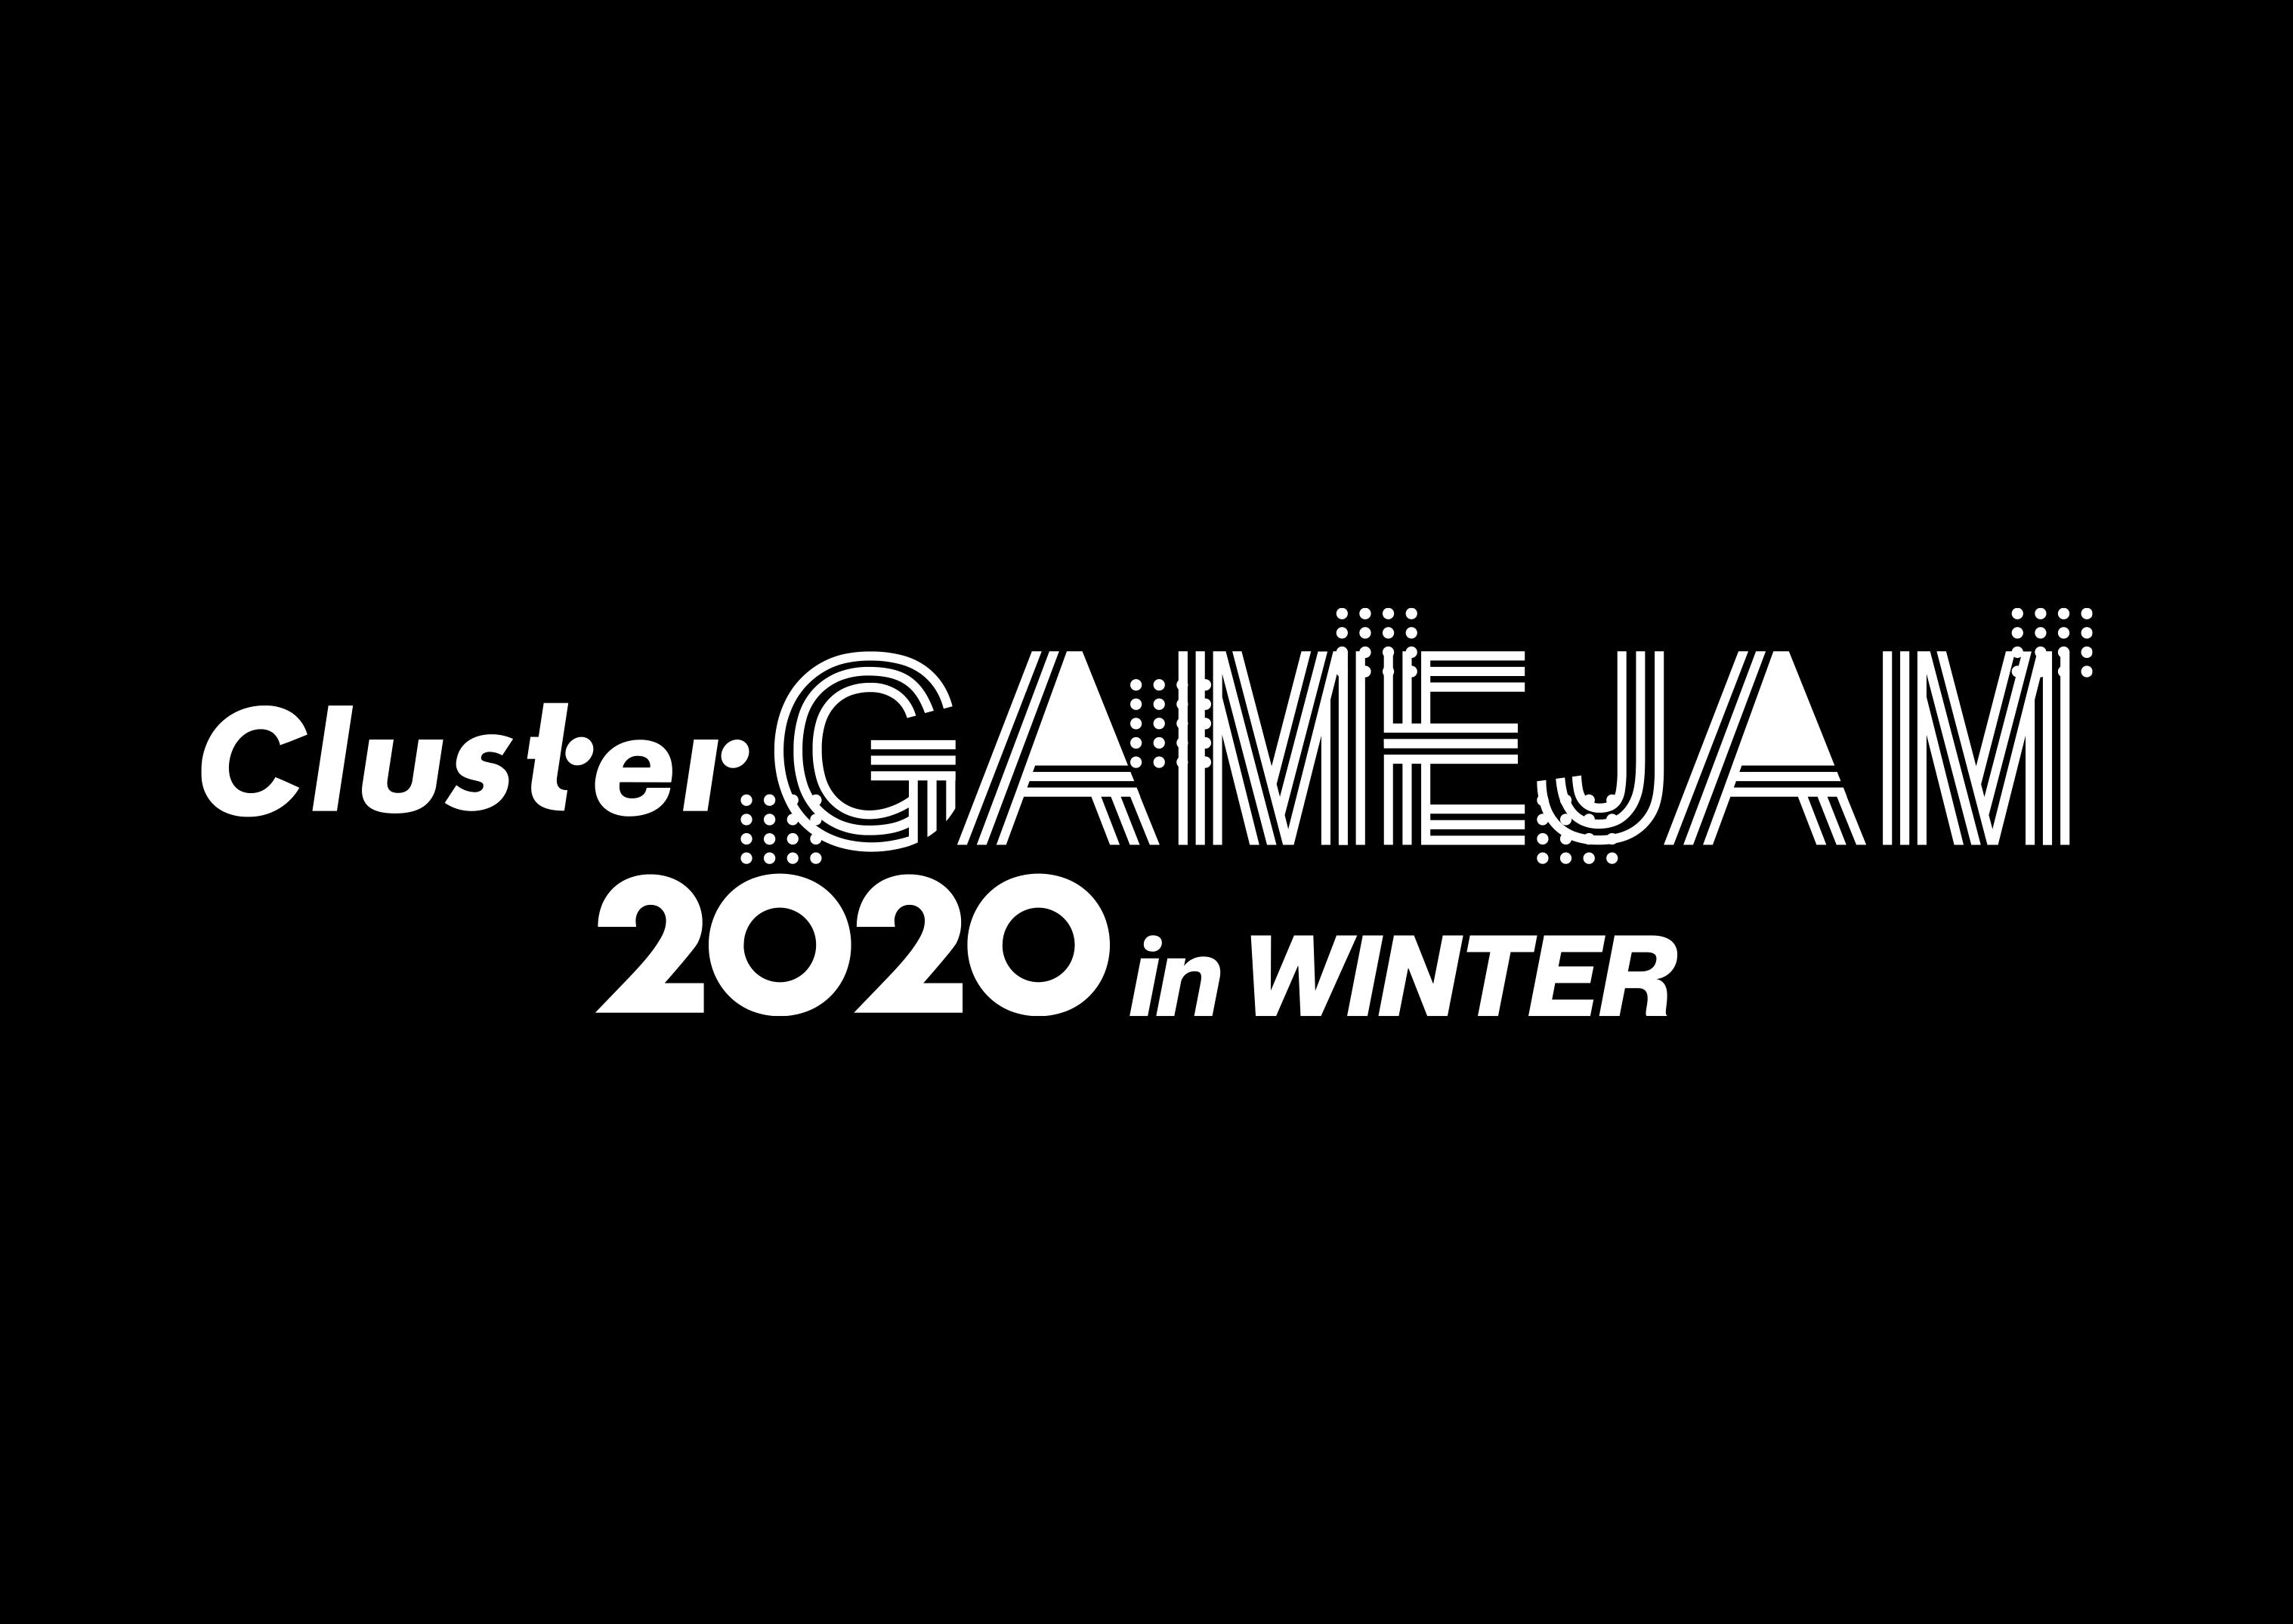 ClusterGAMEJAM 2020 in WINTER